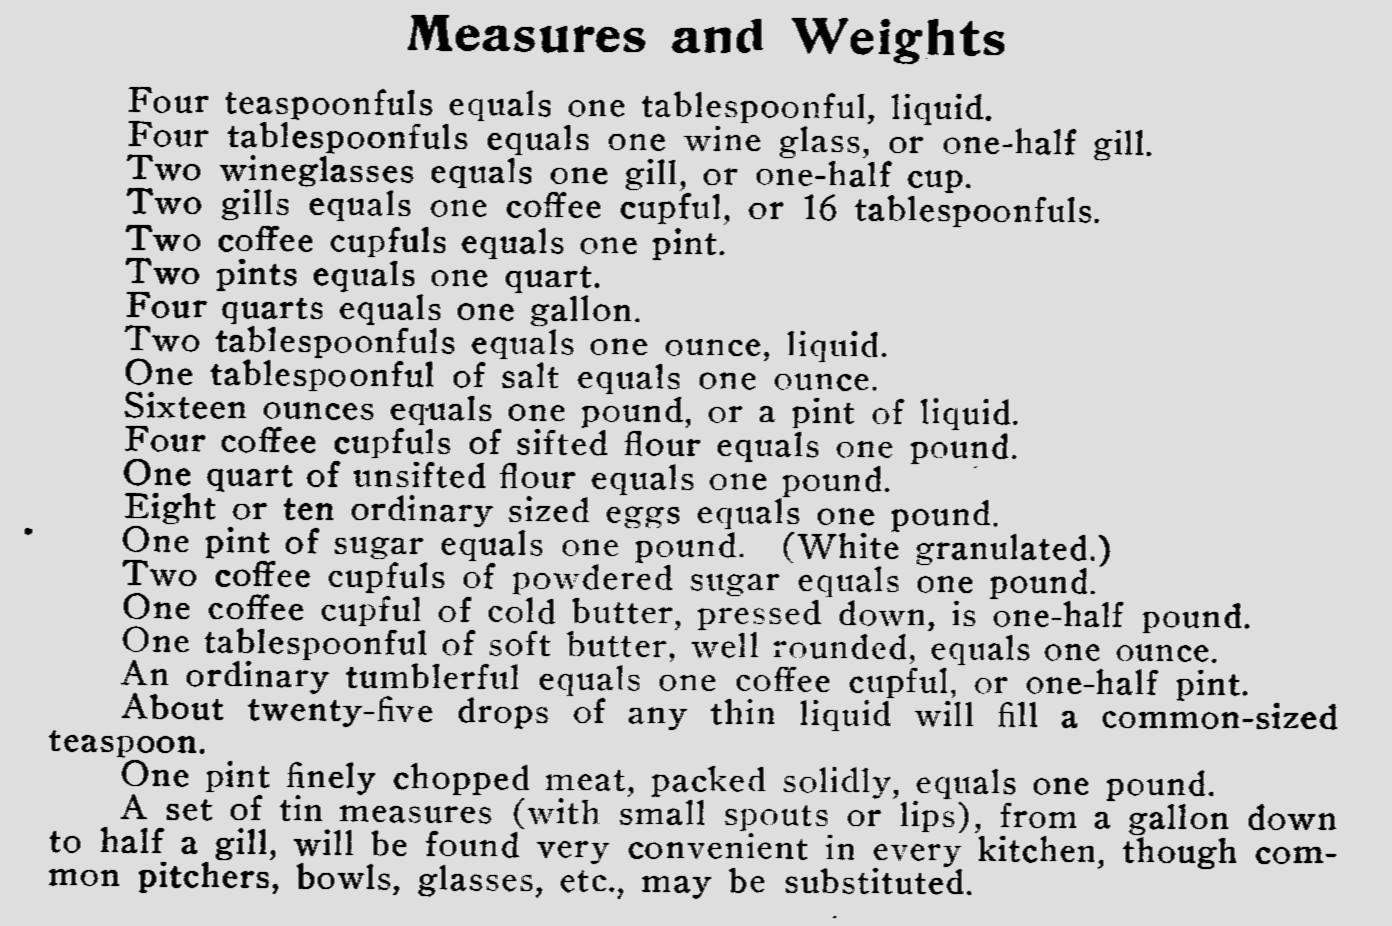 Cooking Measurement Conversion Chart | LoveToKnow